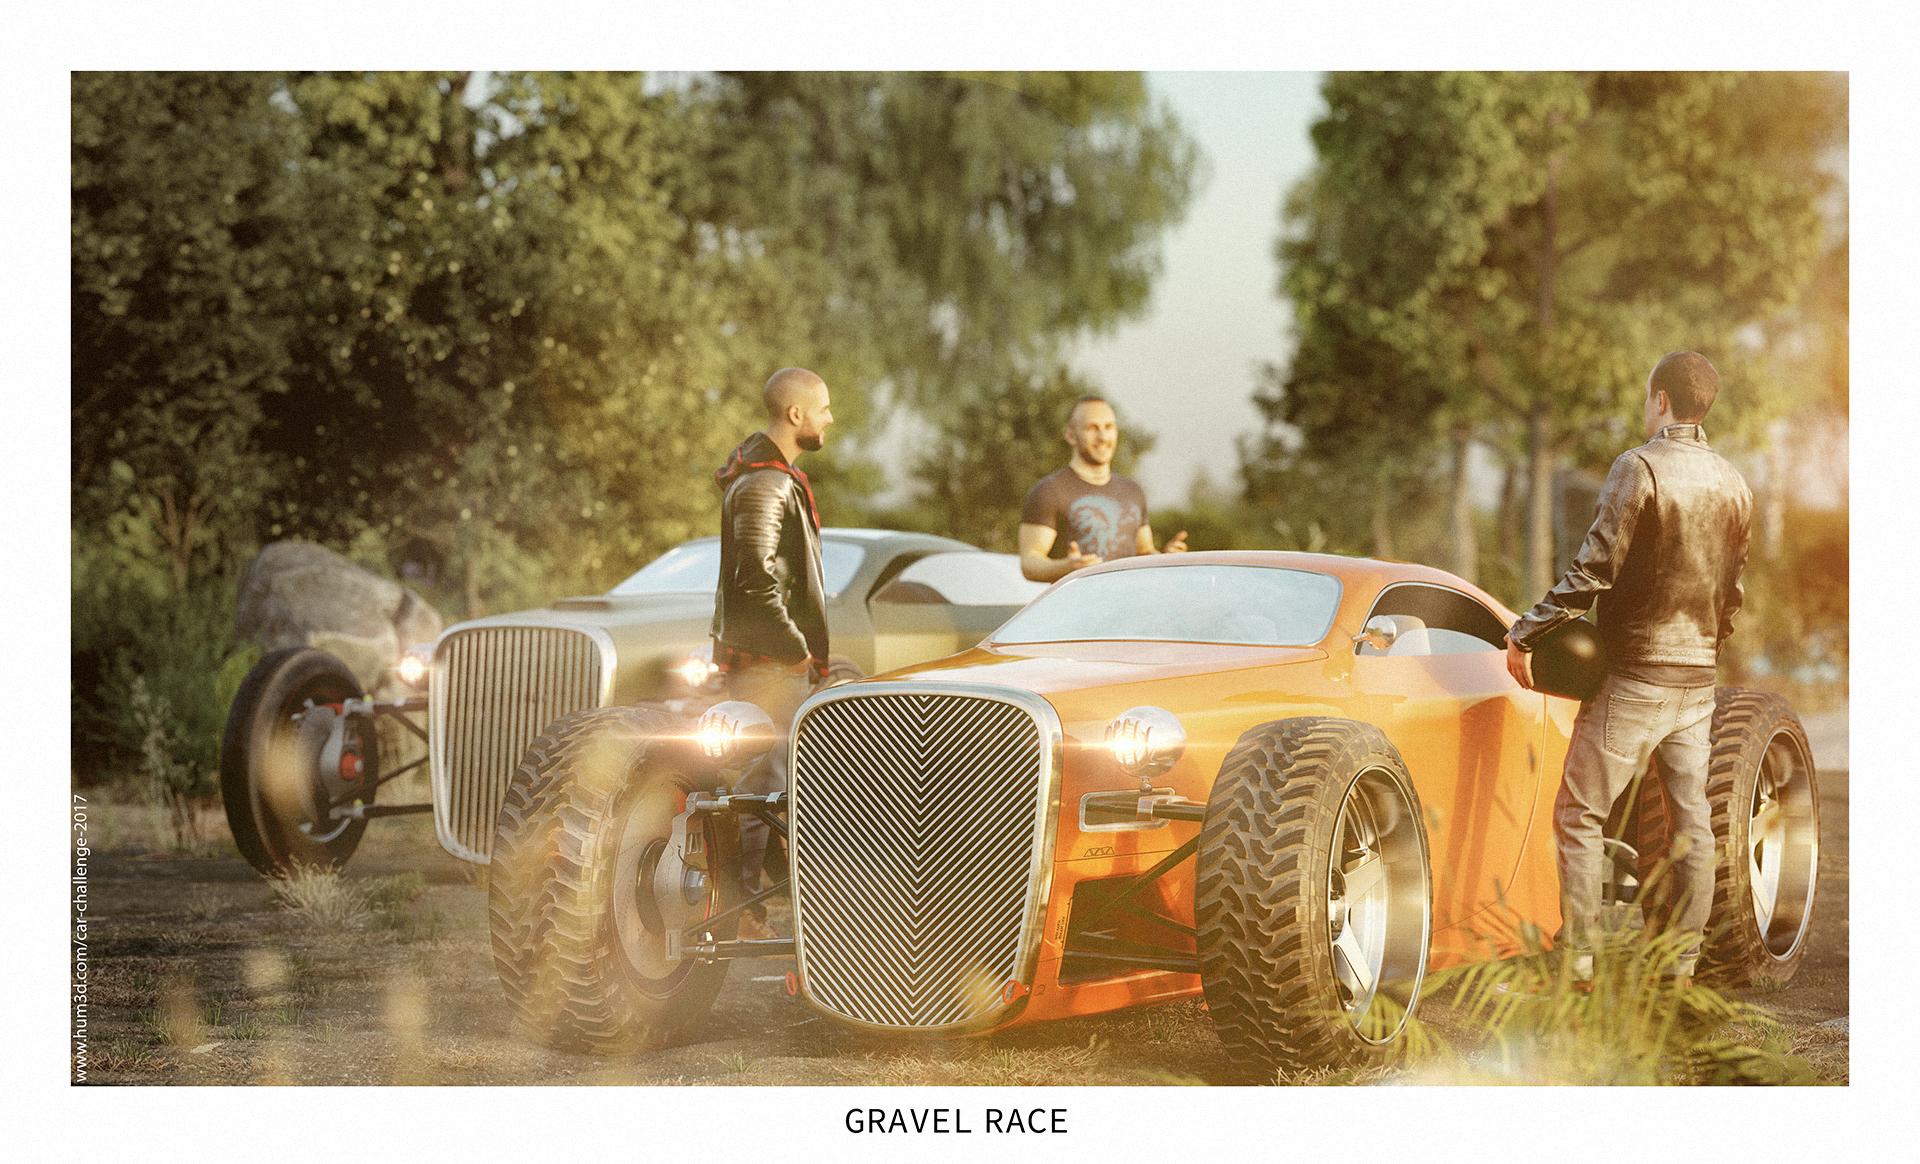 Gravel Race 3d art